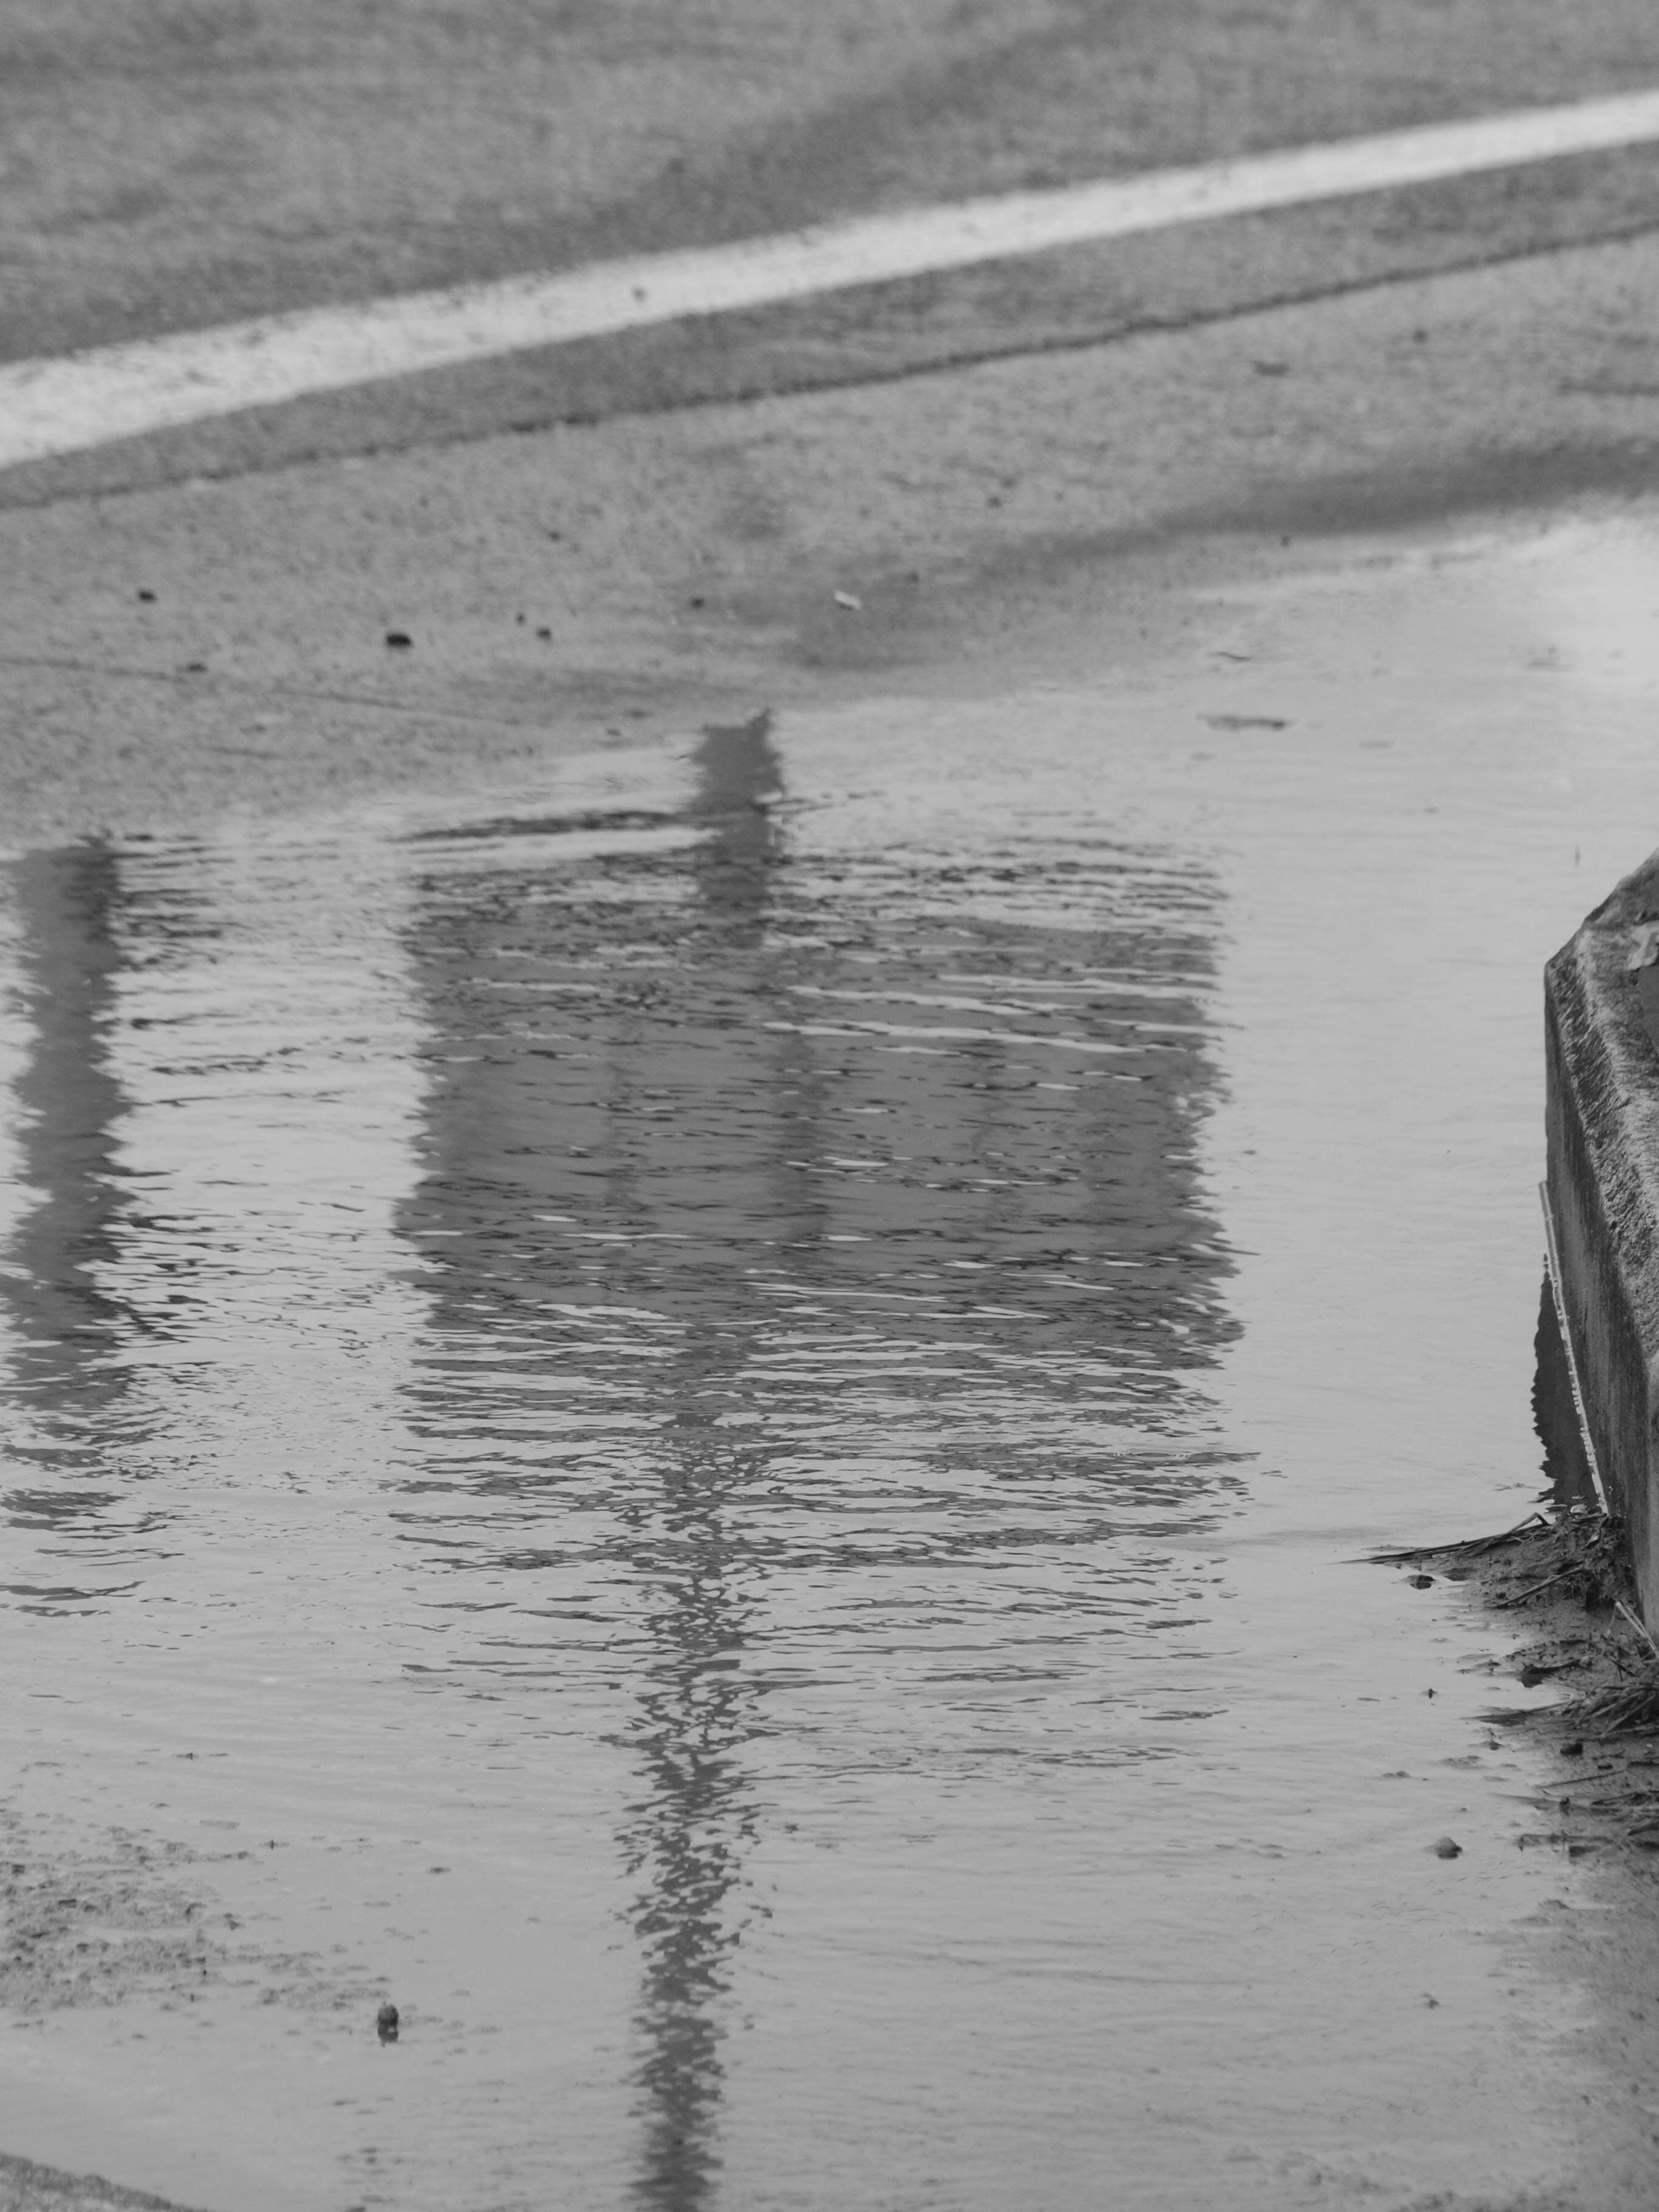 Gratis lagerfoto af regn, vand, vandskygge